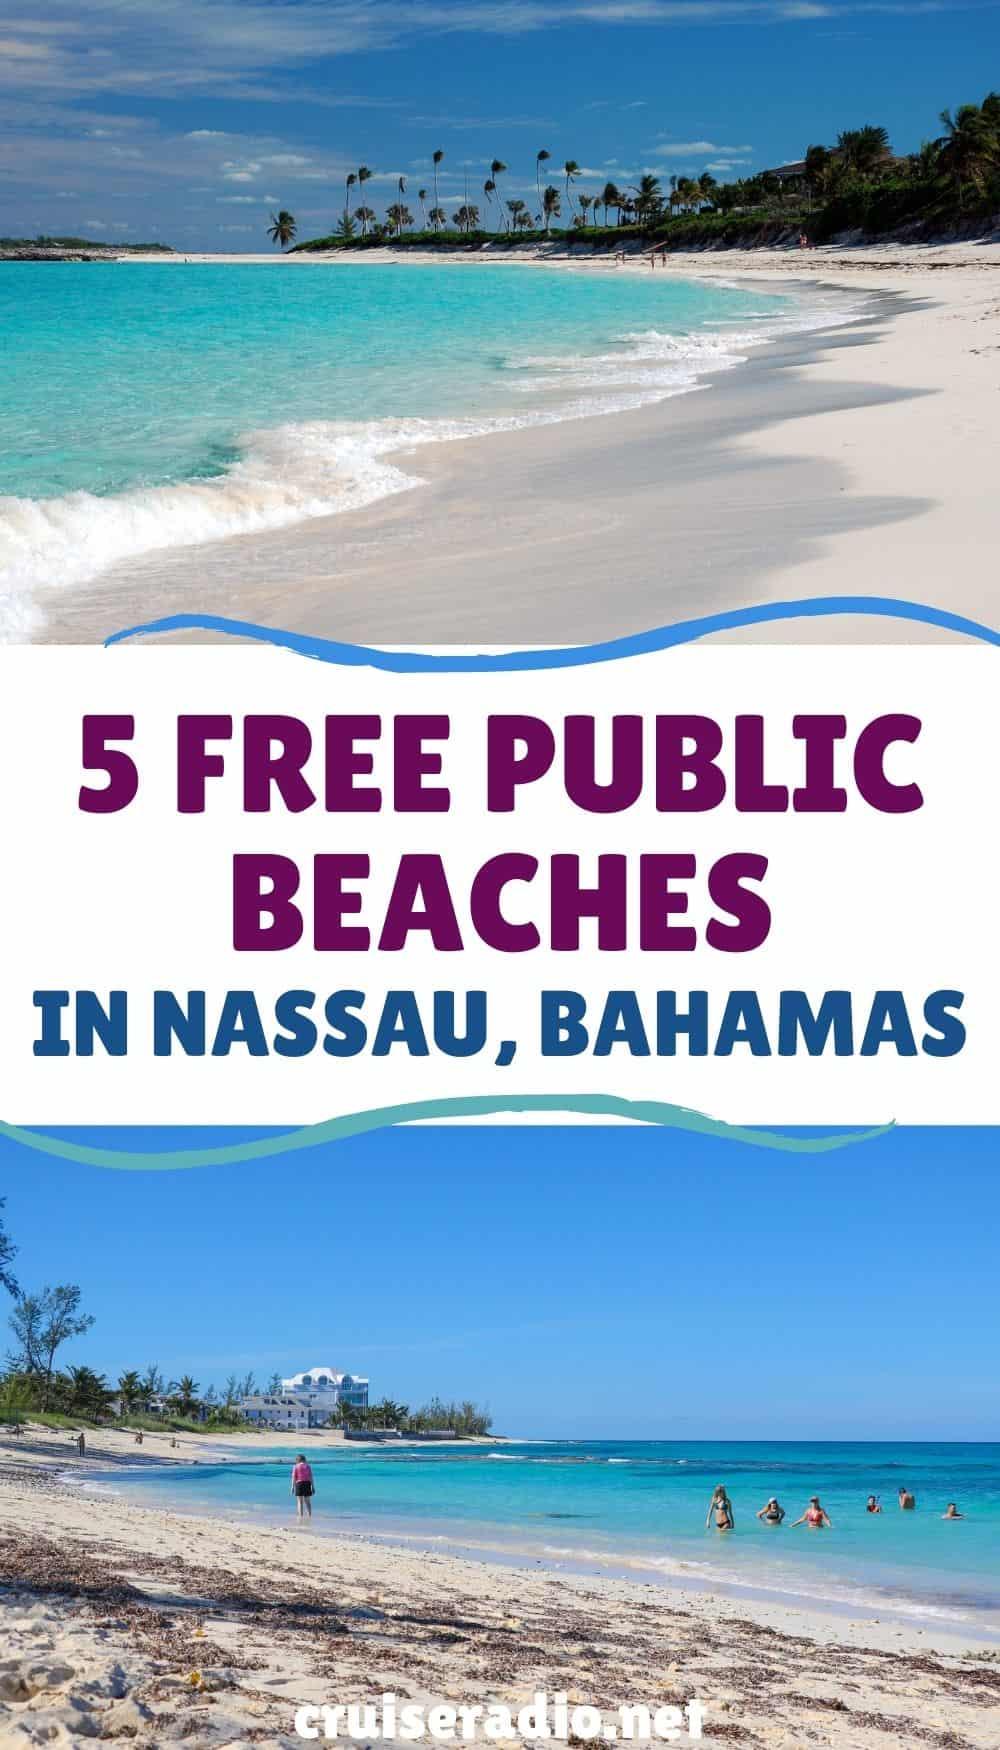 5 free public beaches in nassau, bahamas